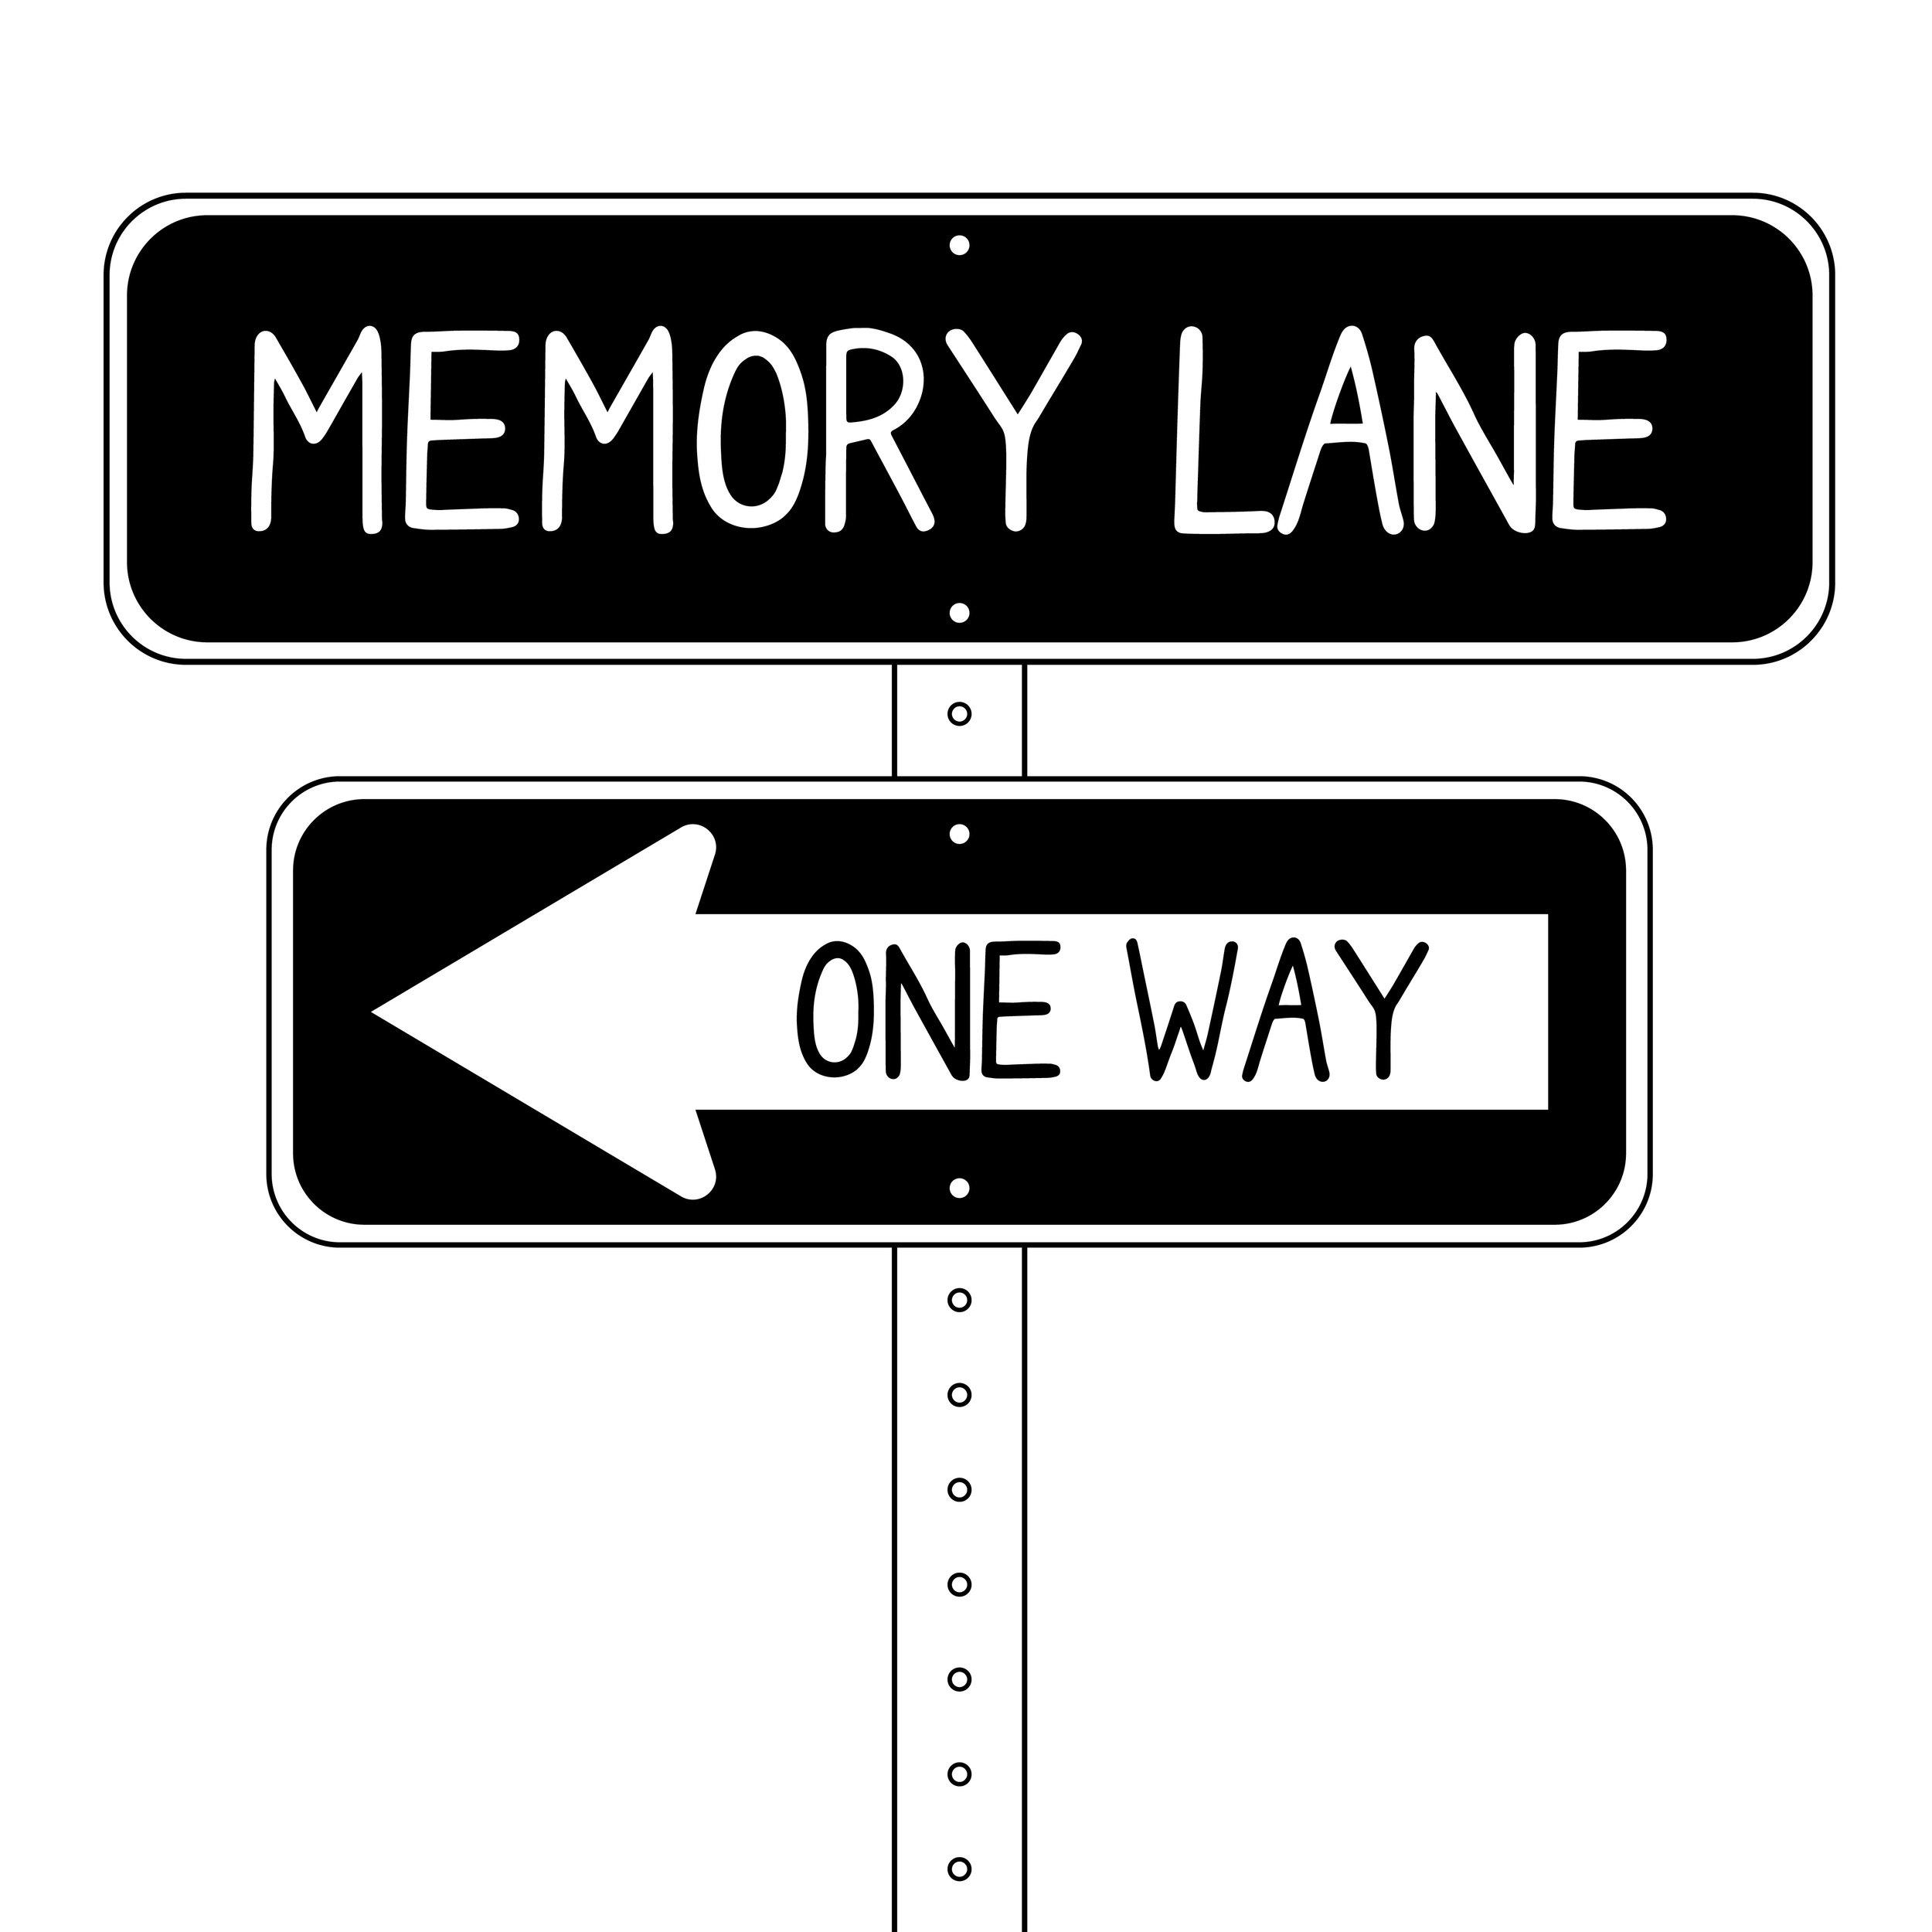 memory lane-01.jpg